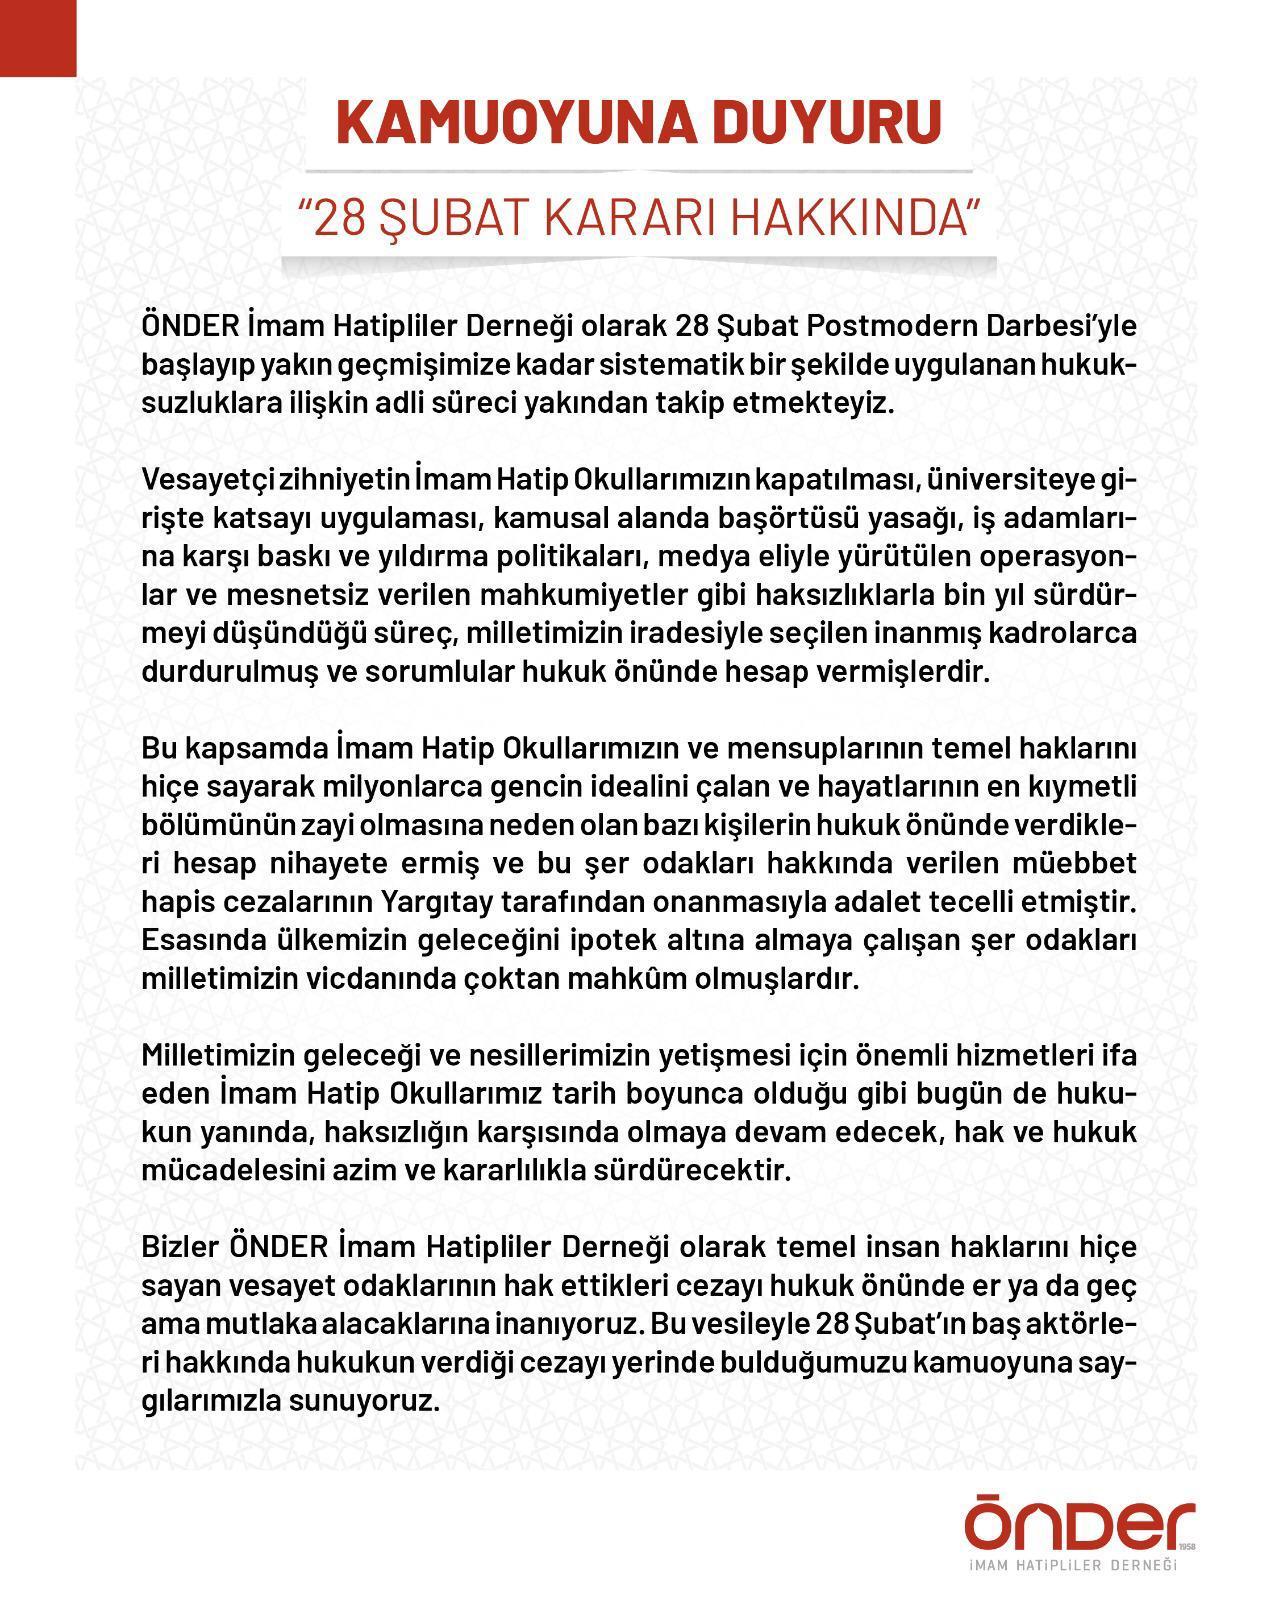 BAŞKAN KARA'DAN YARGITAY KARARINA DESTEK